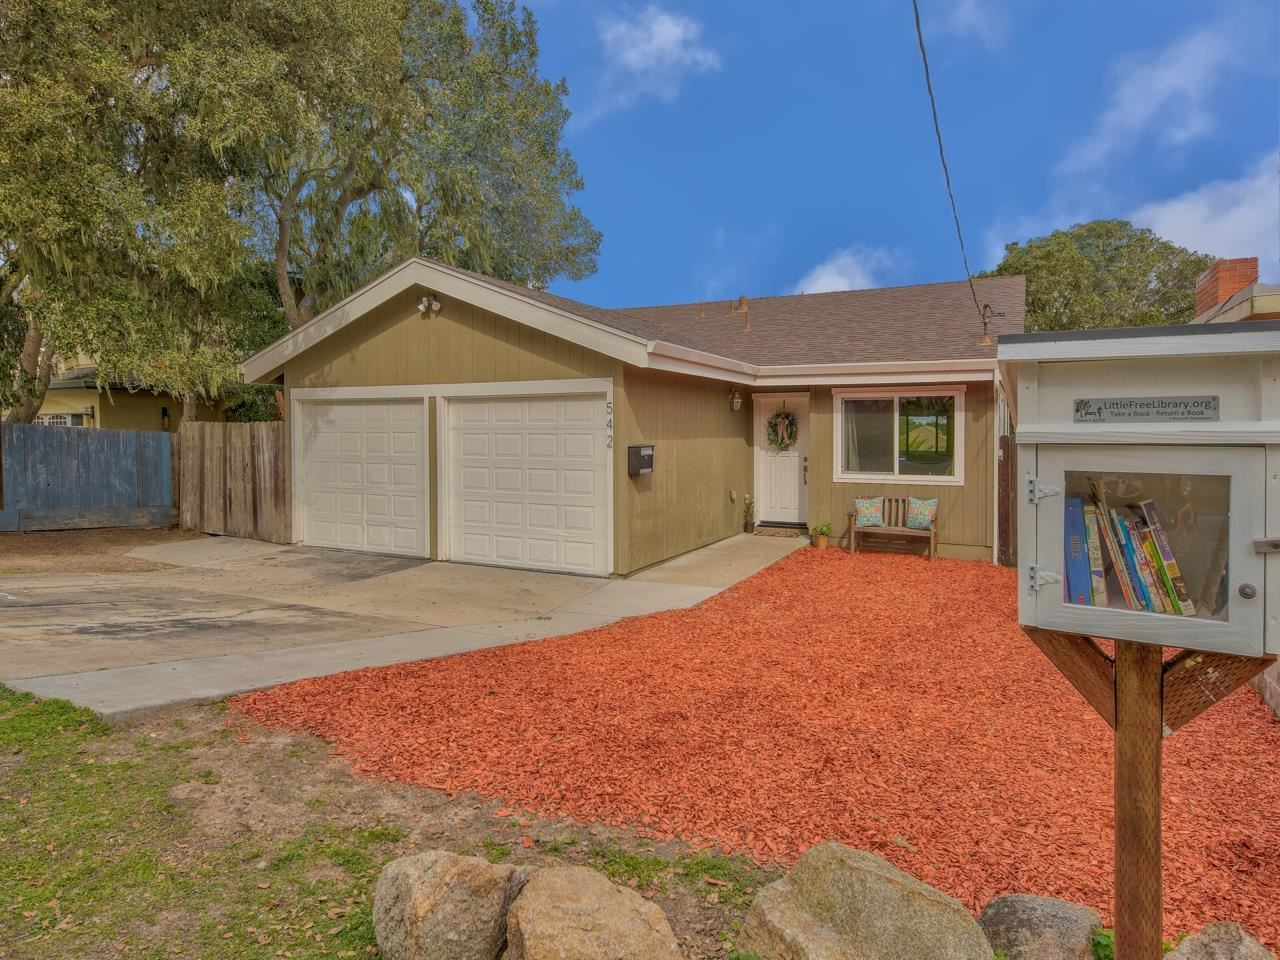 Photo for 542 Oak ST, MONTEREY, CA 93940 (MLS # ML81829351)